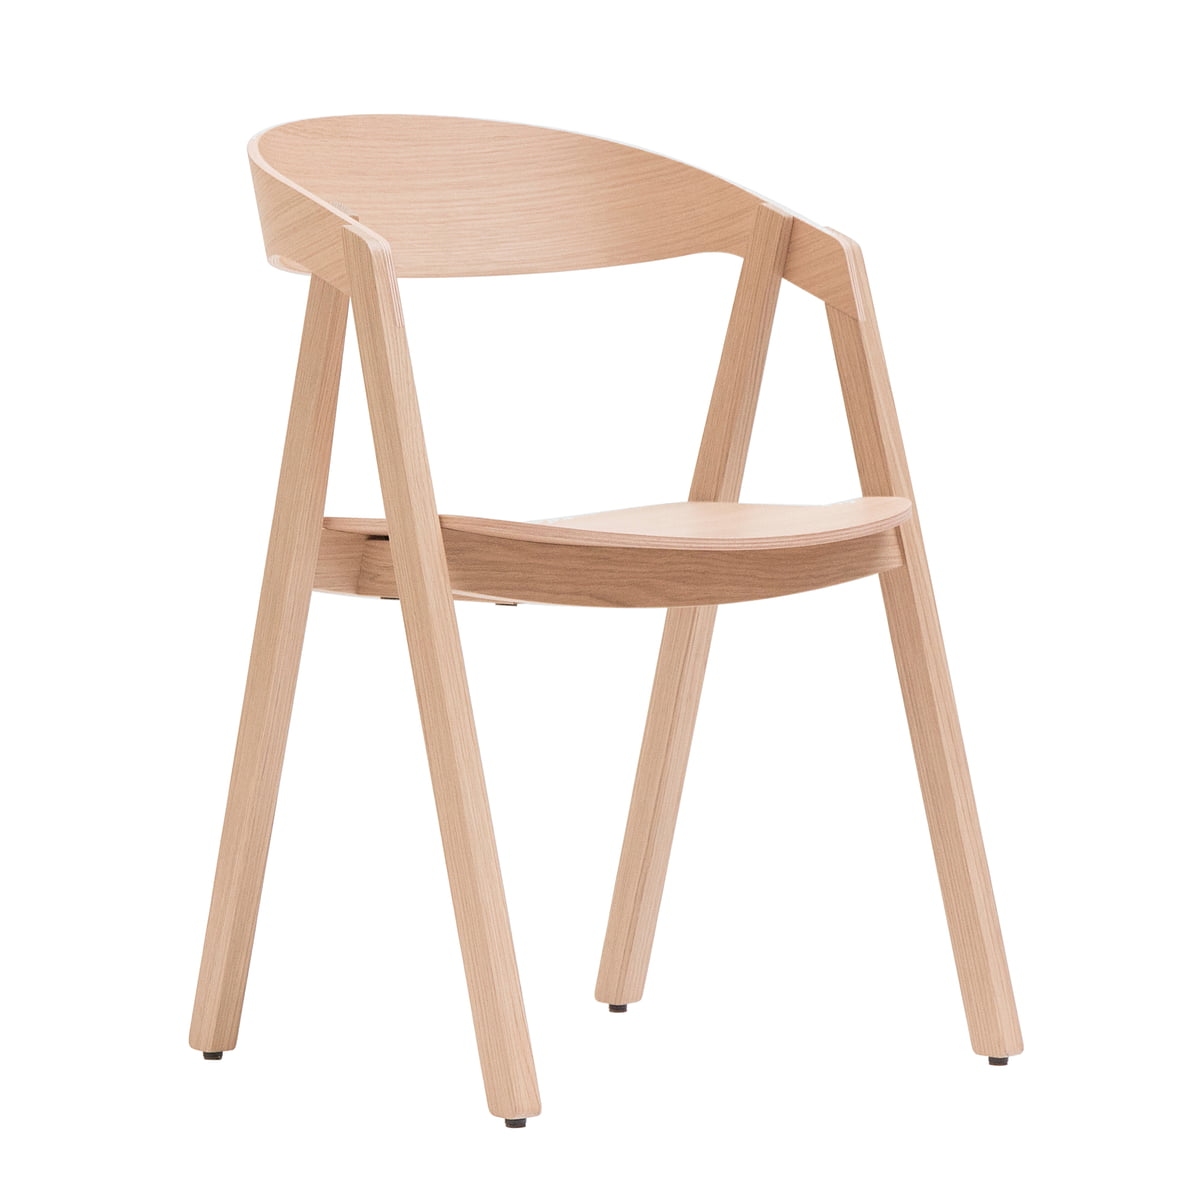 nardo stuhl von maigrau im wohndesign shop. Black Bedroom Furniture Sets. Home Design Ideas